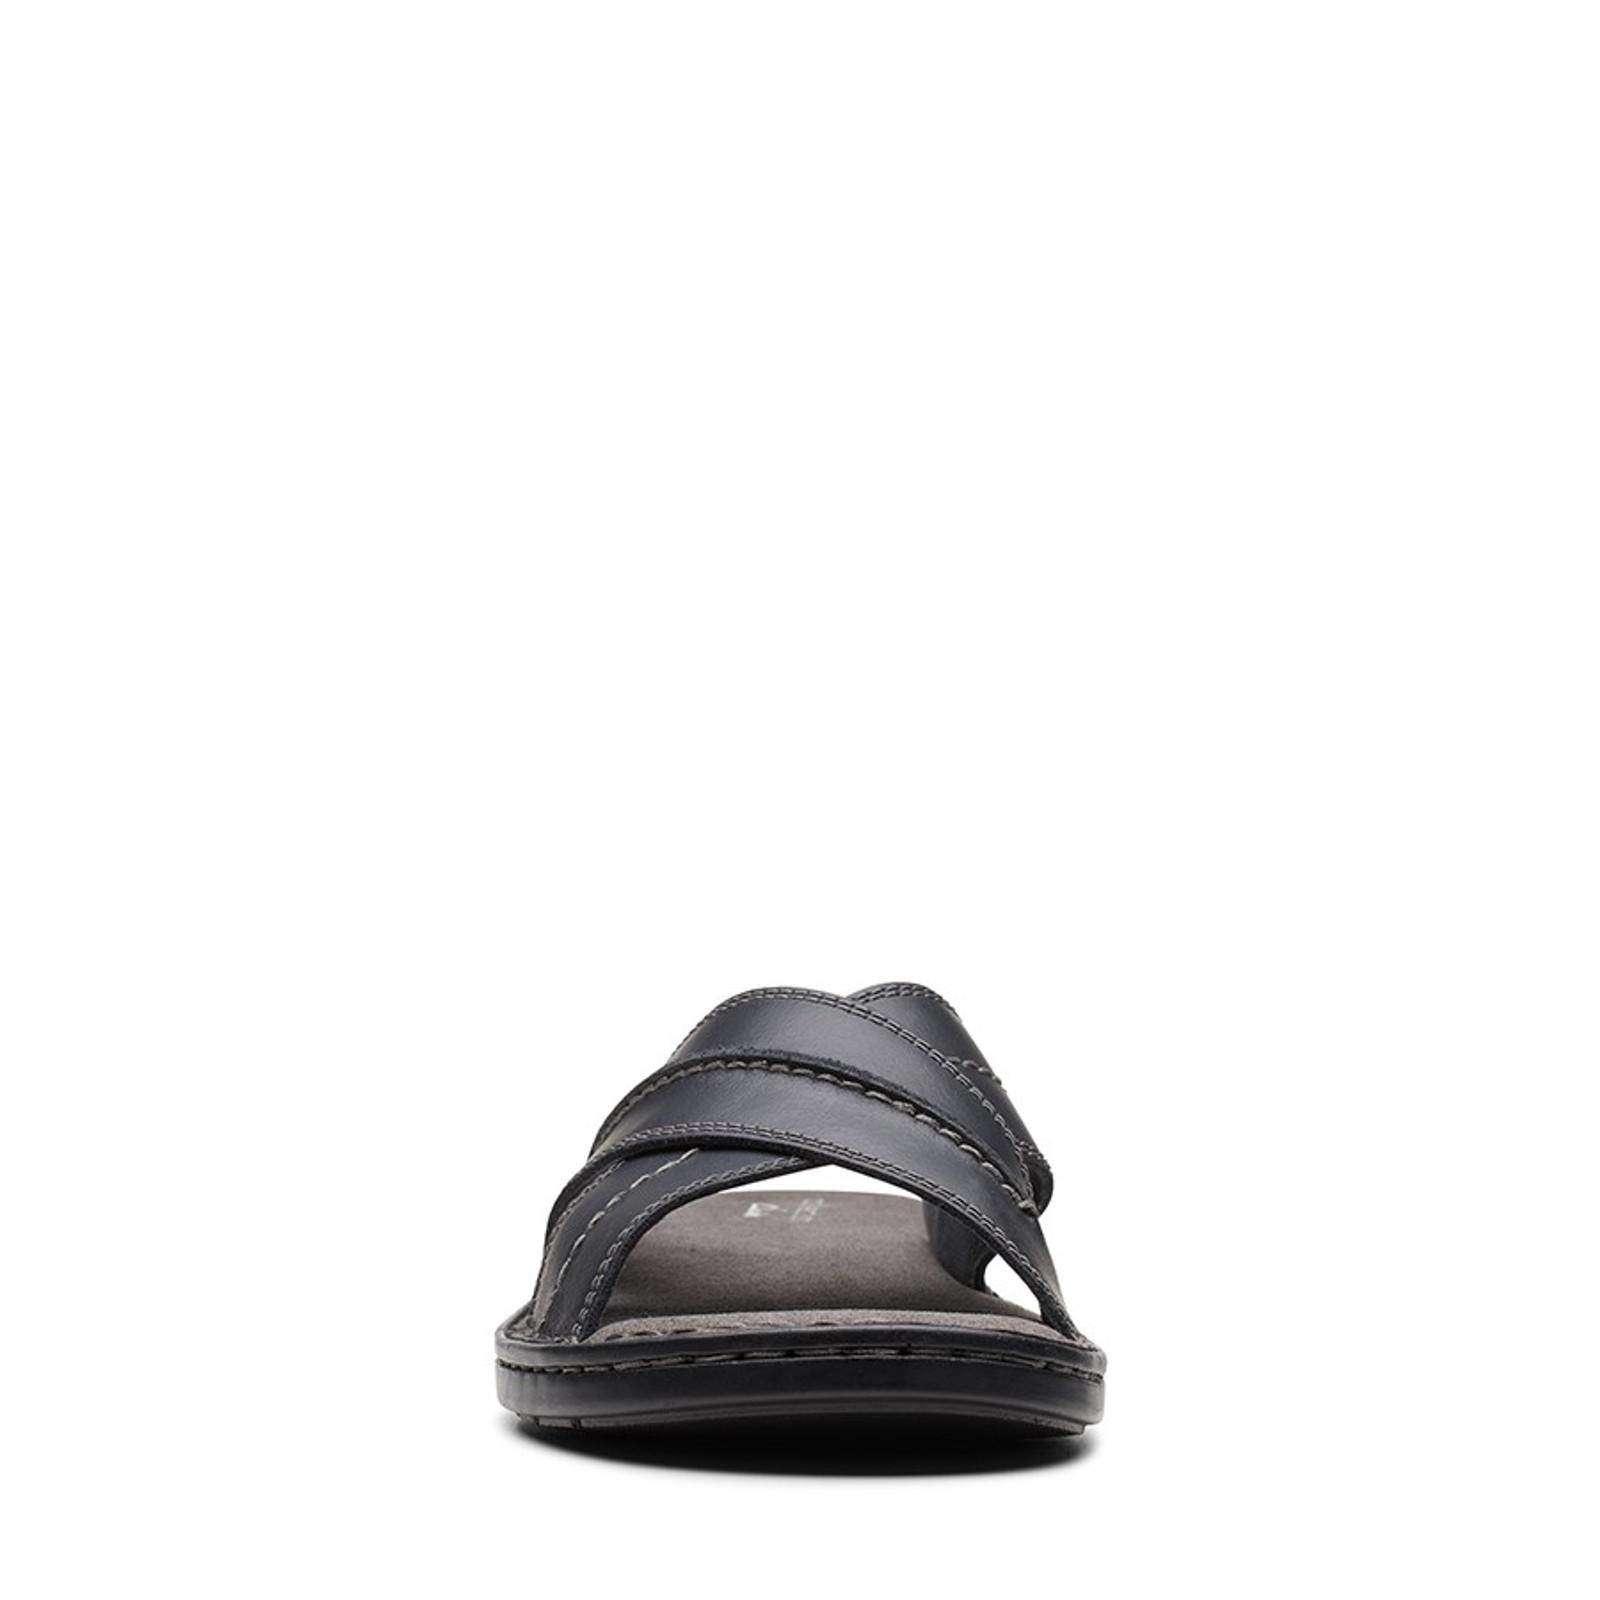 Clarks Mens MALONE CROSS Black Leather